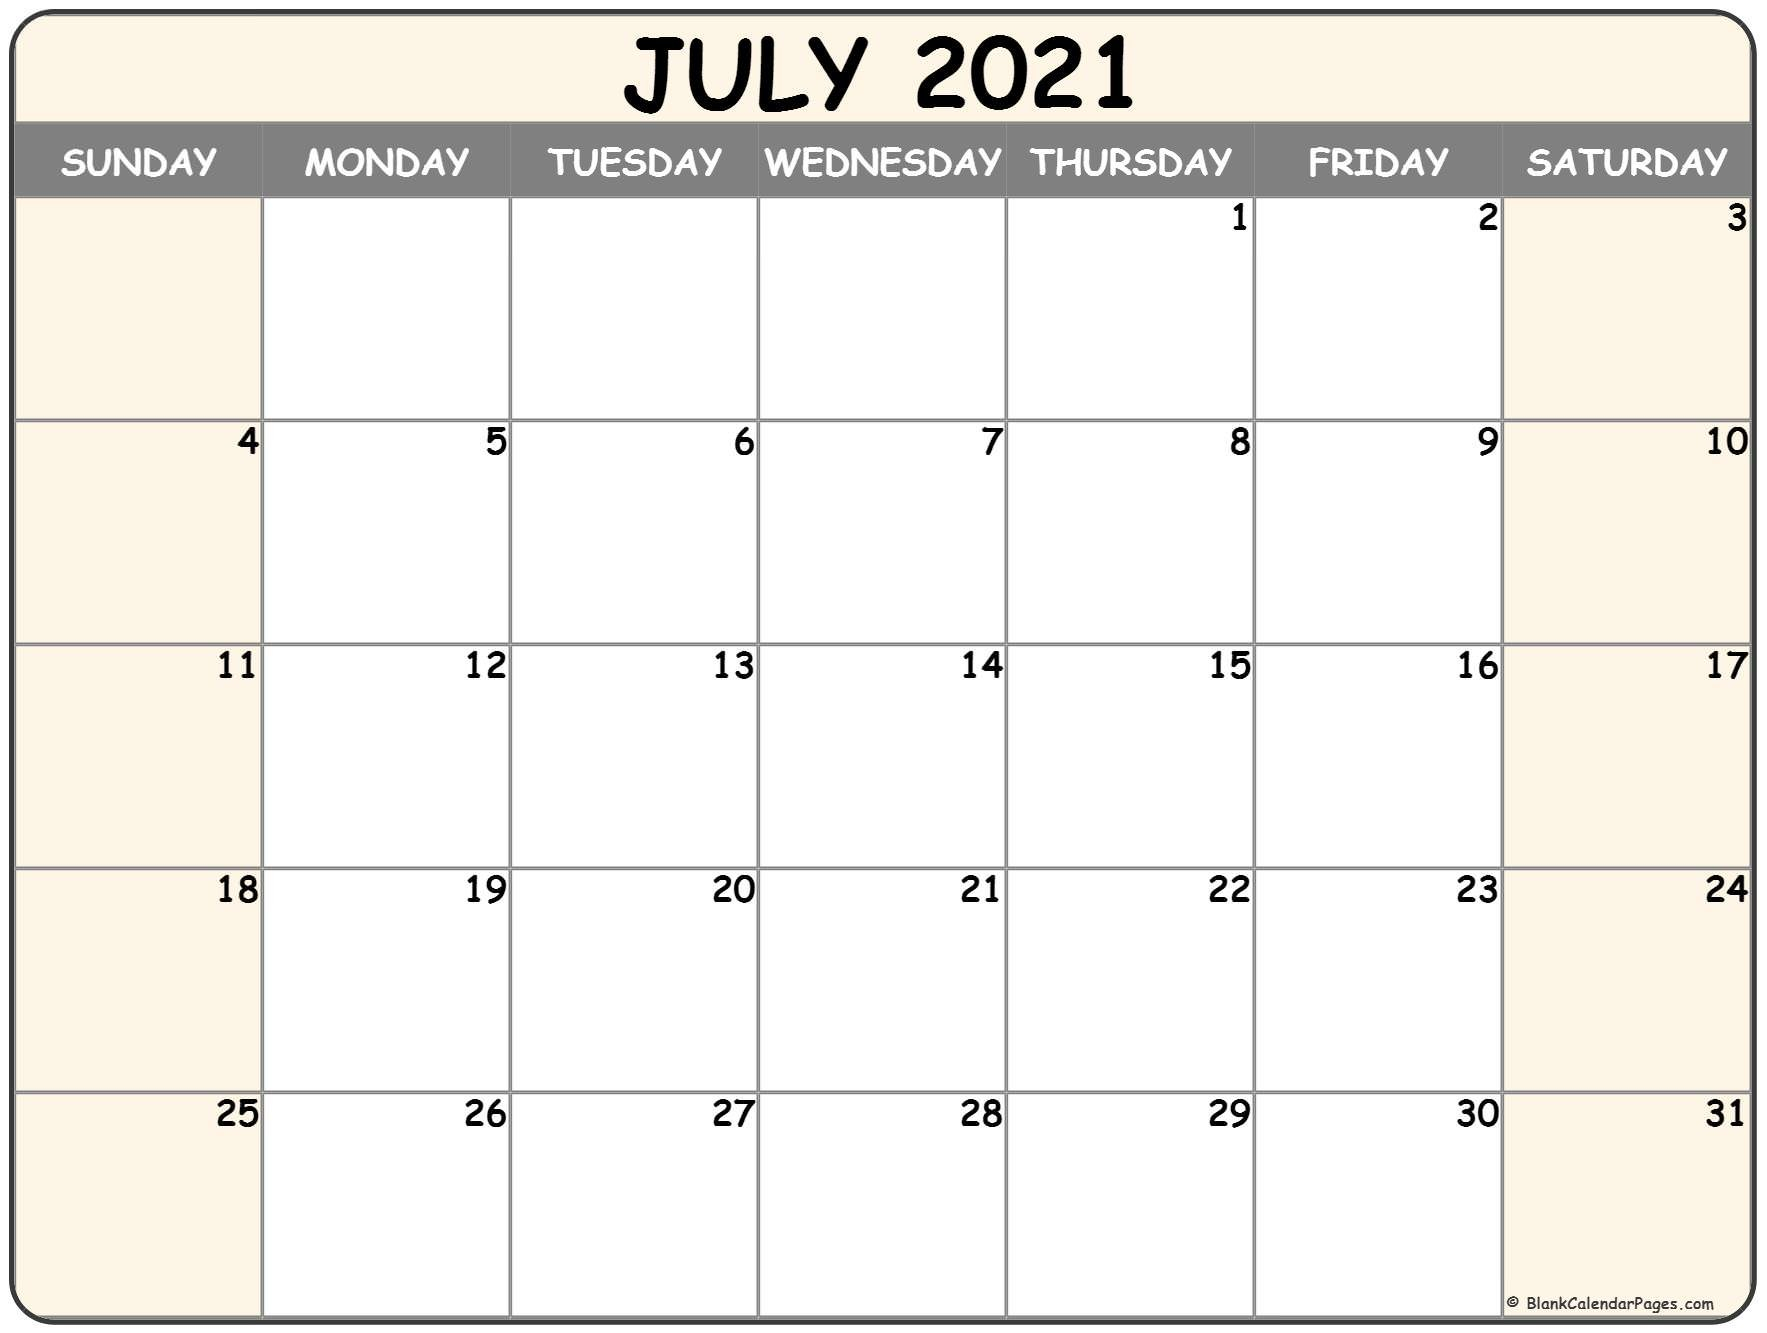 July 2021 Blank Calendar Templates. Free Bold Printable Calnder Jully